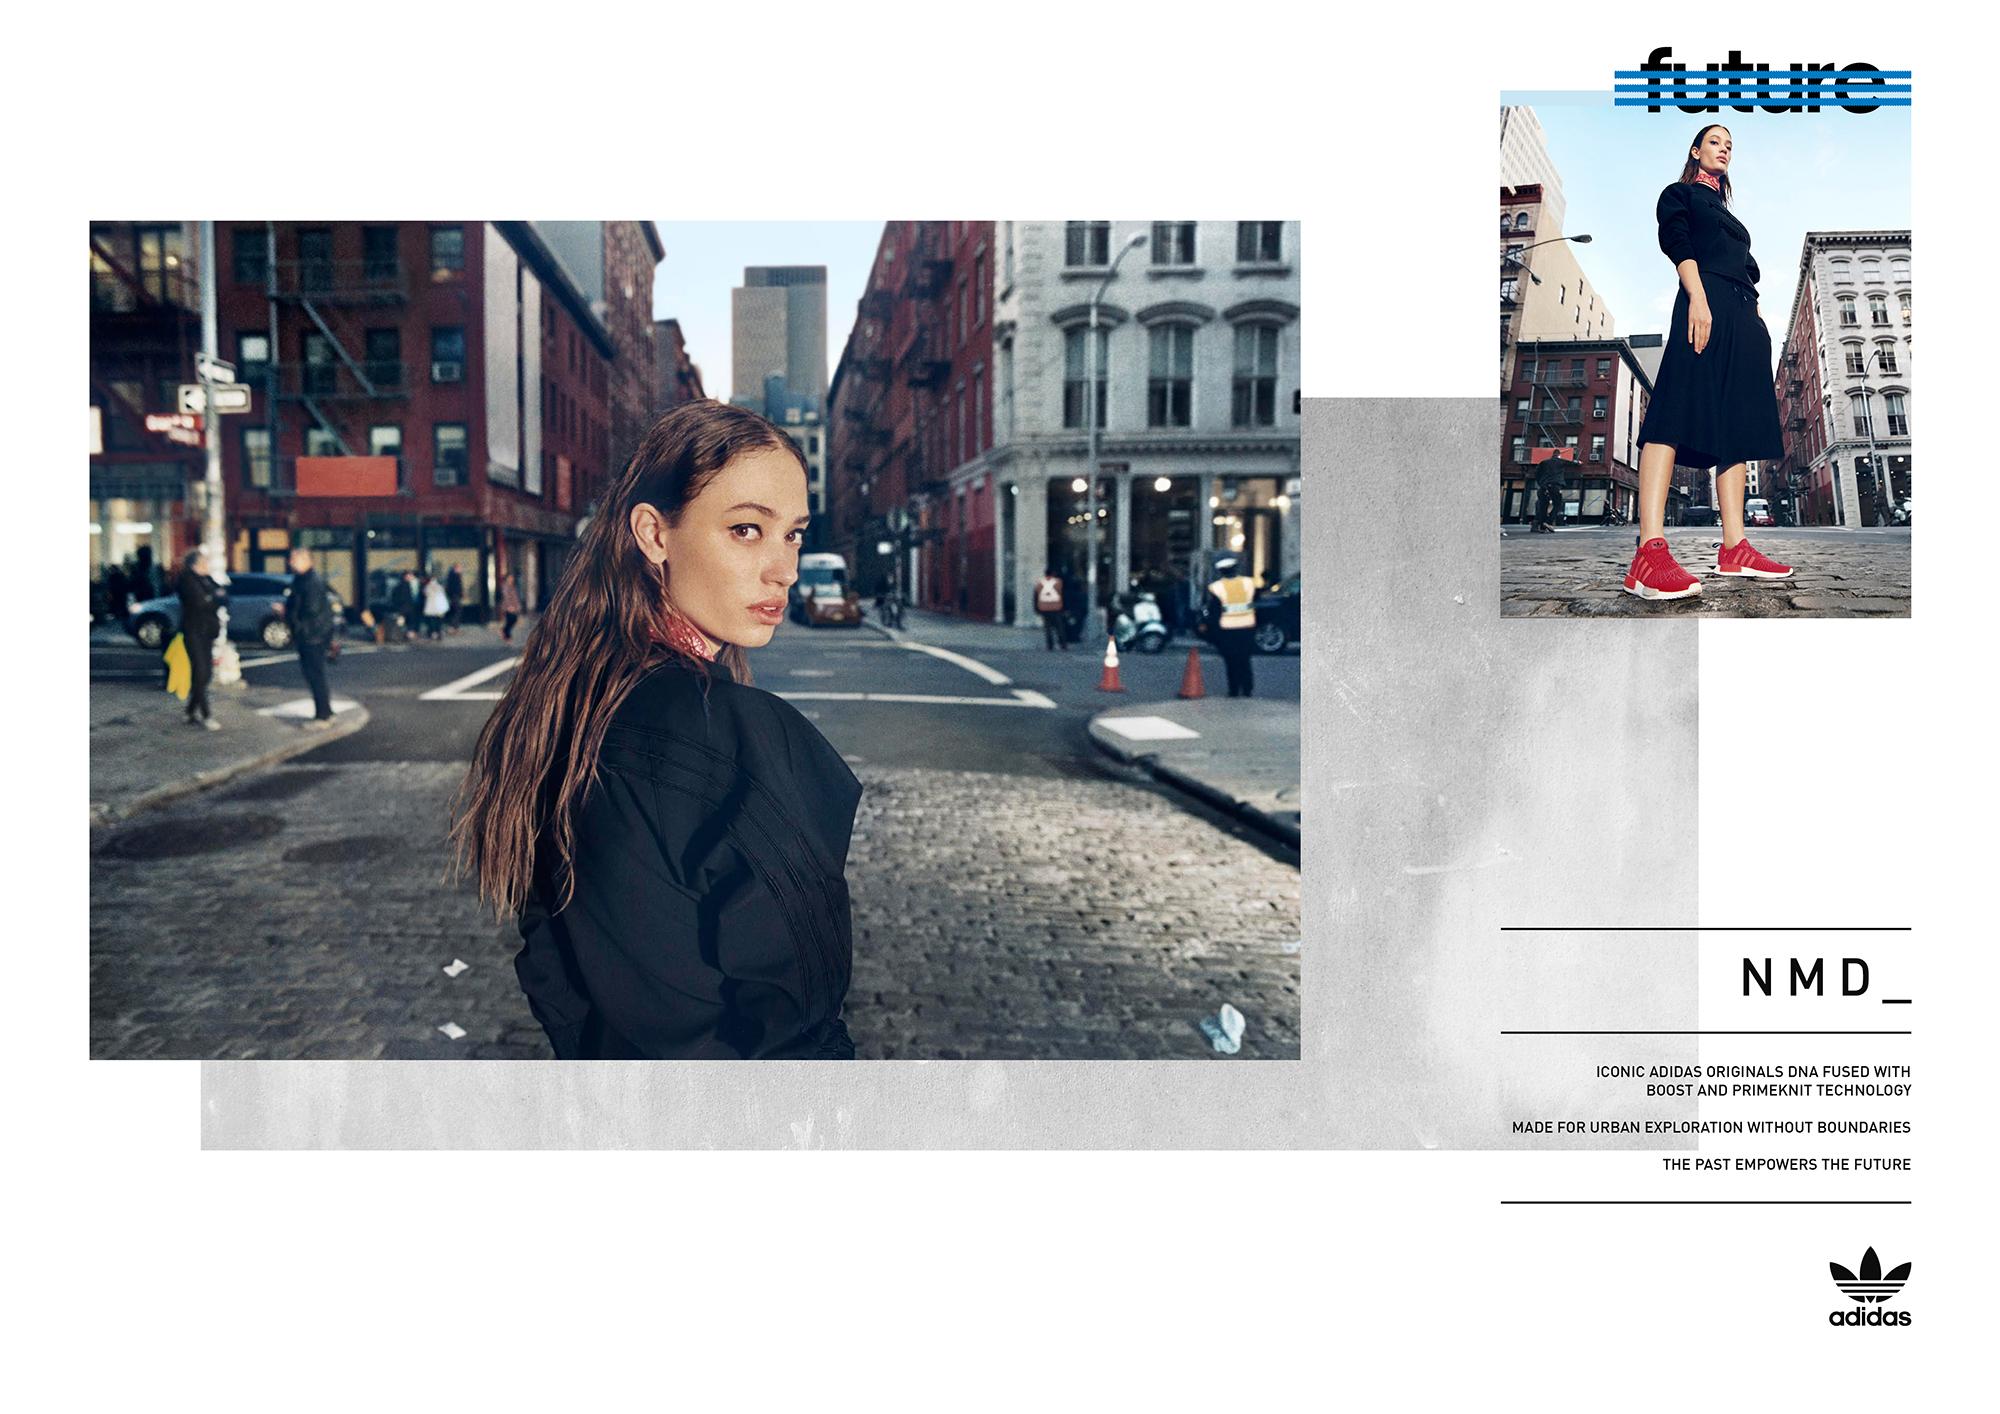 Adidas_SS16_Advertising_29.jpg